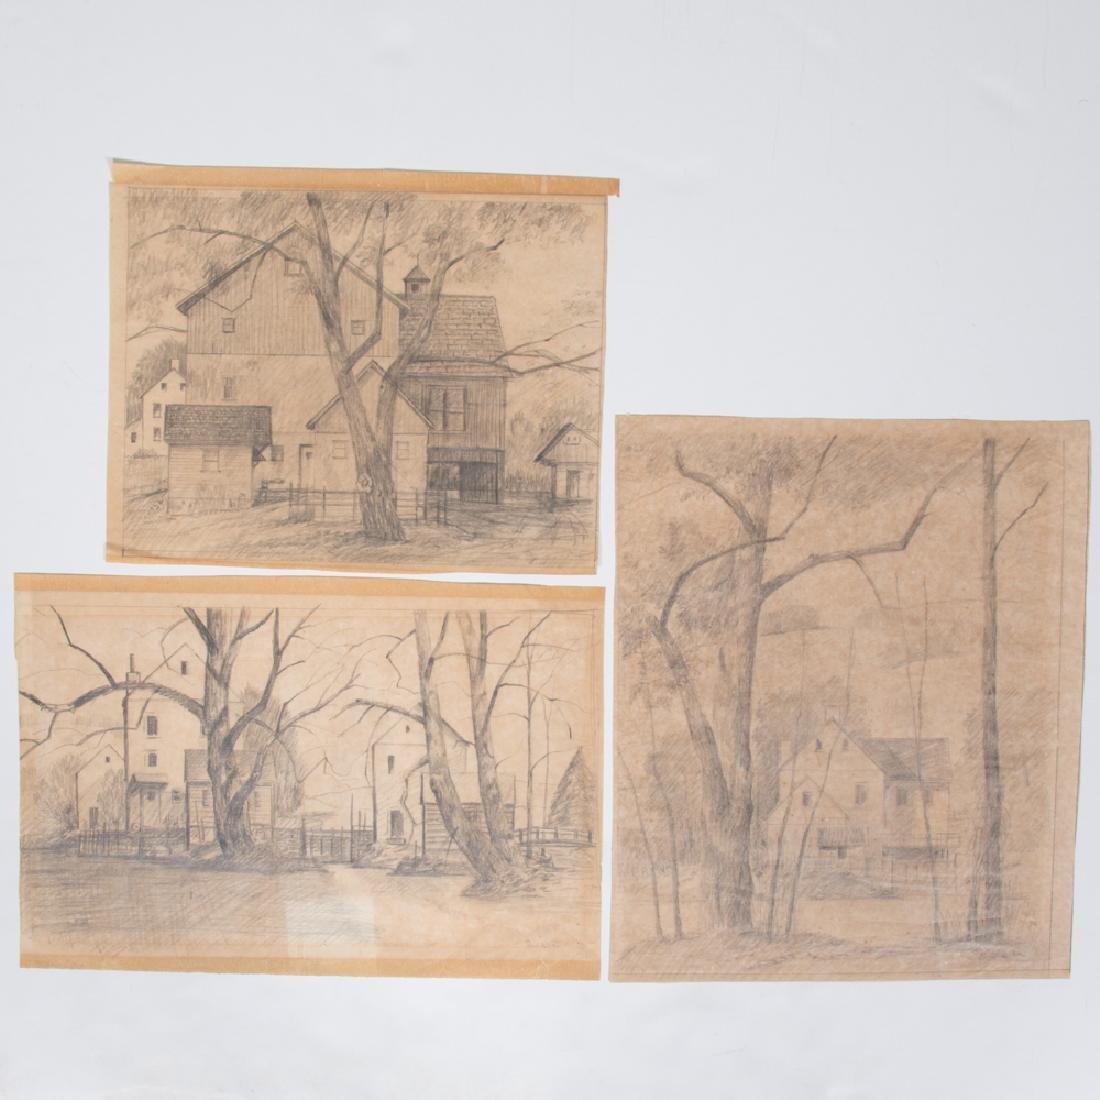 Paul Riba (1912-1977) A Group of Three Landscape